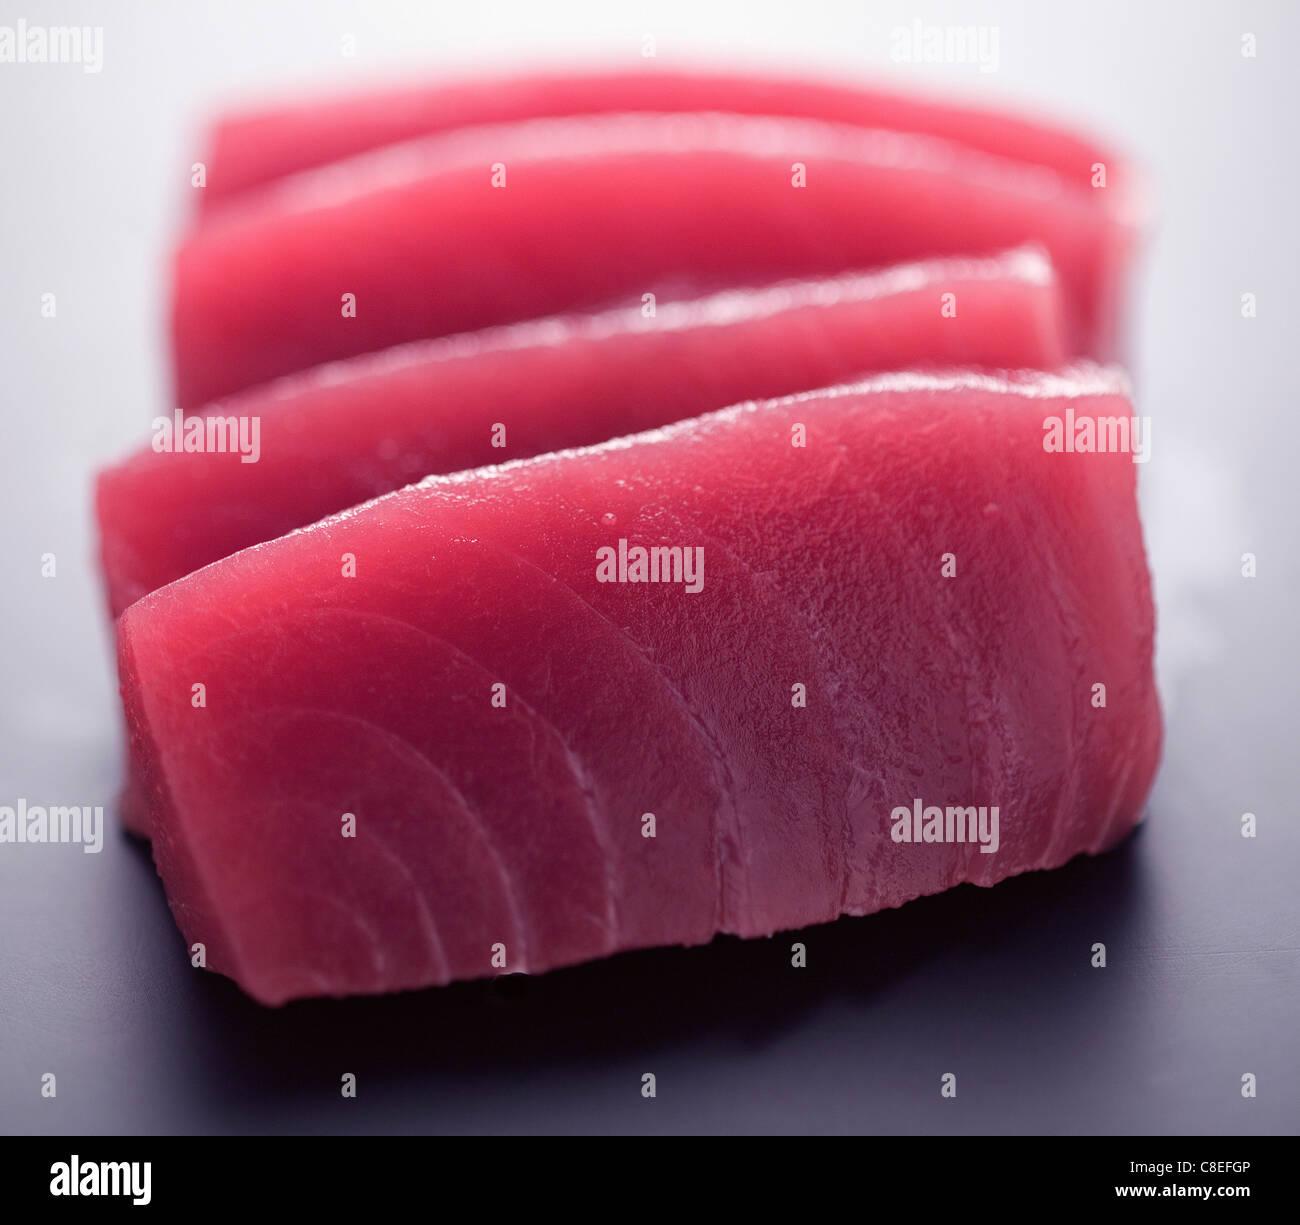 Tonno rosso sashimis Immagini Stock